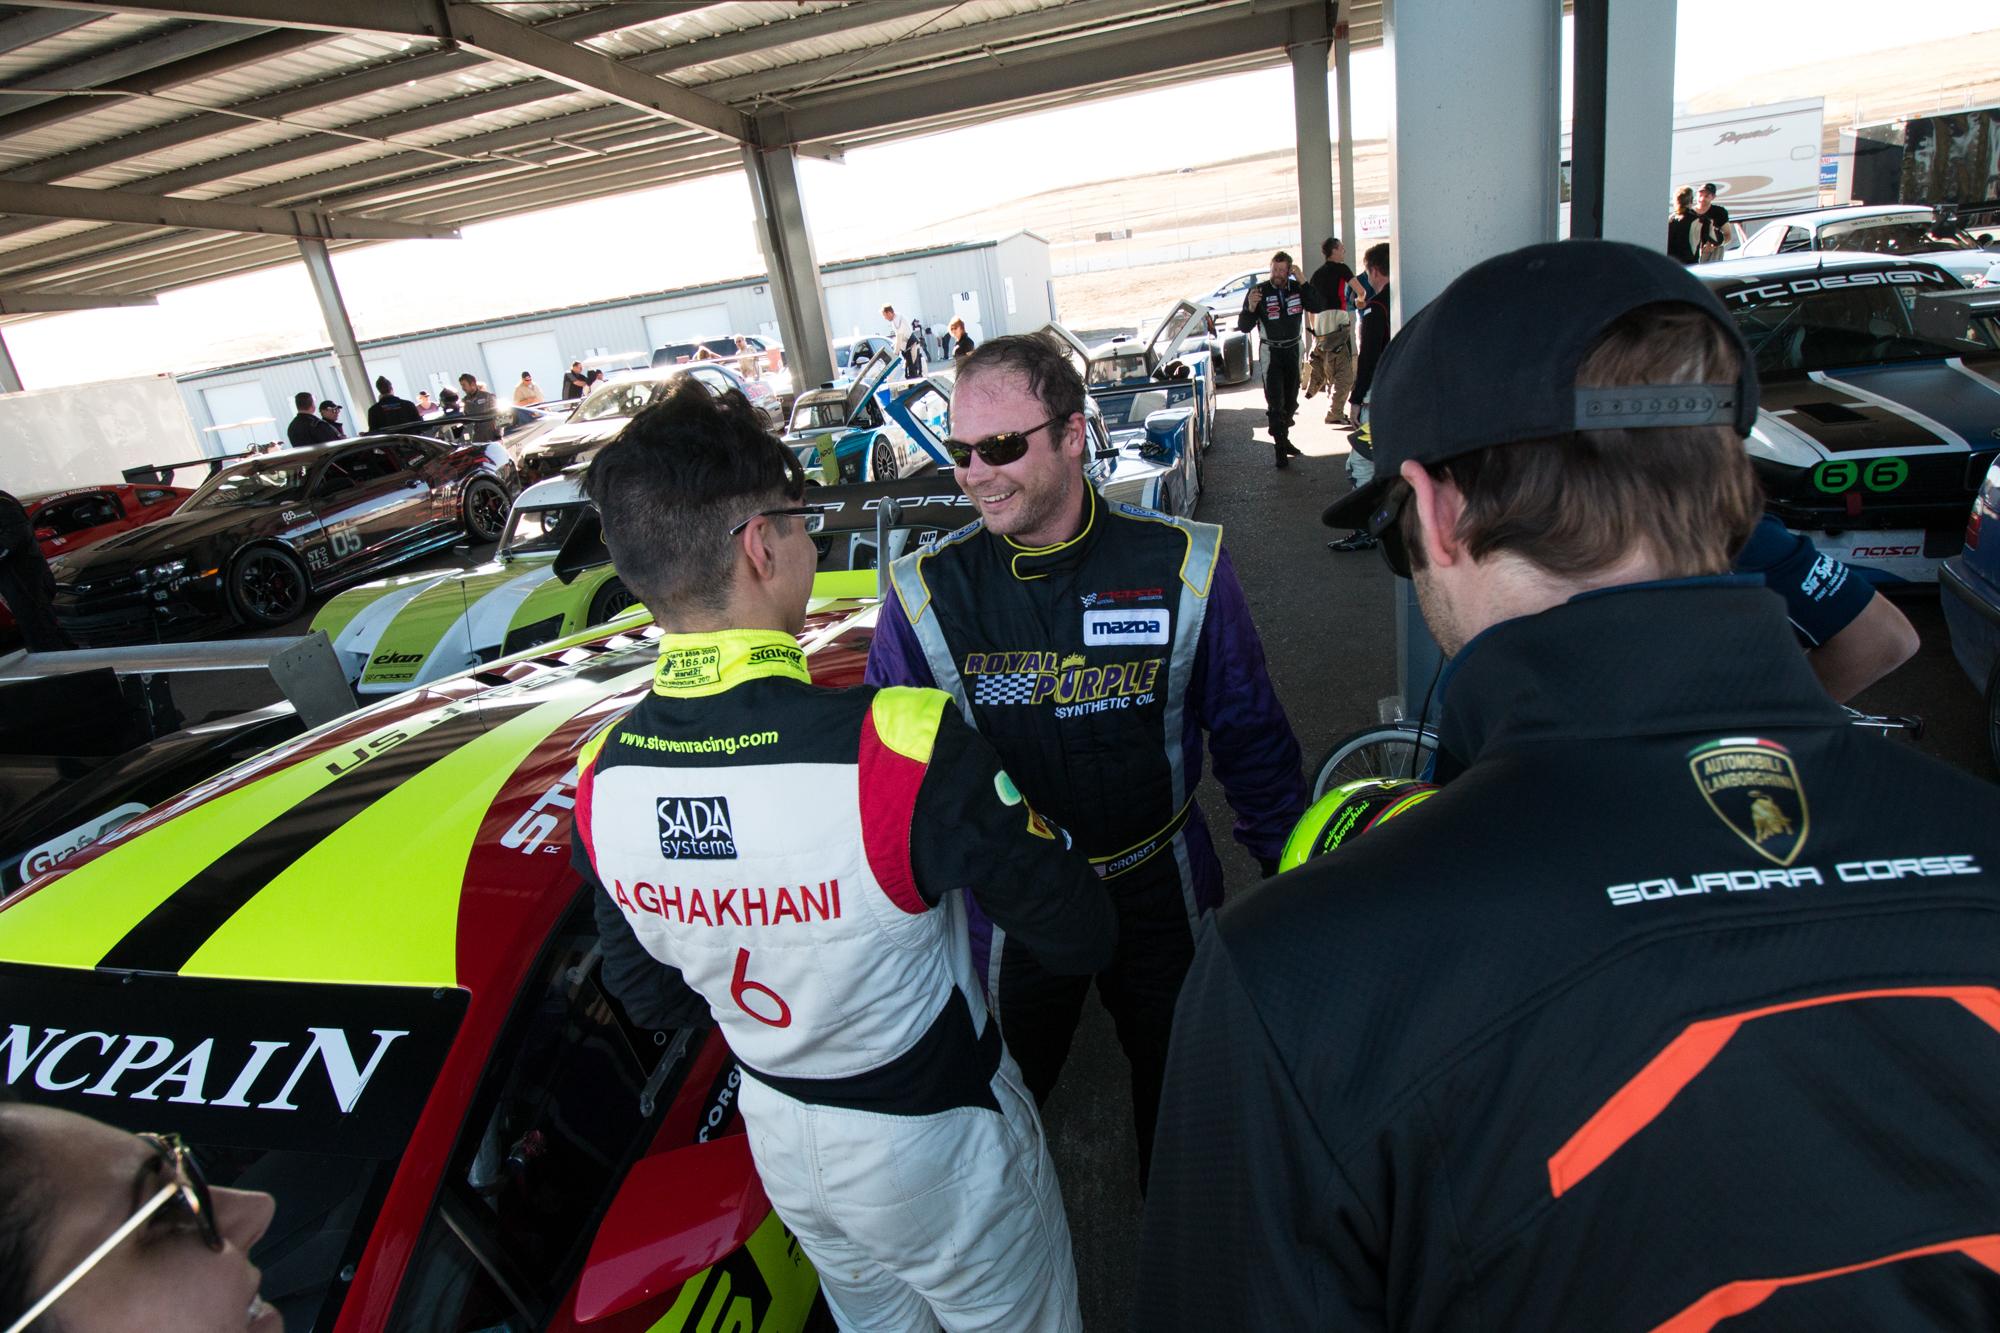 Steven-Racing-20130208-45849.jpg